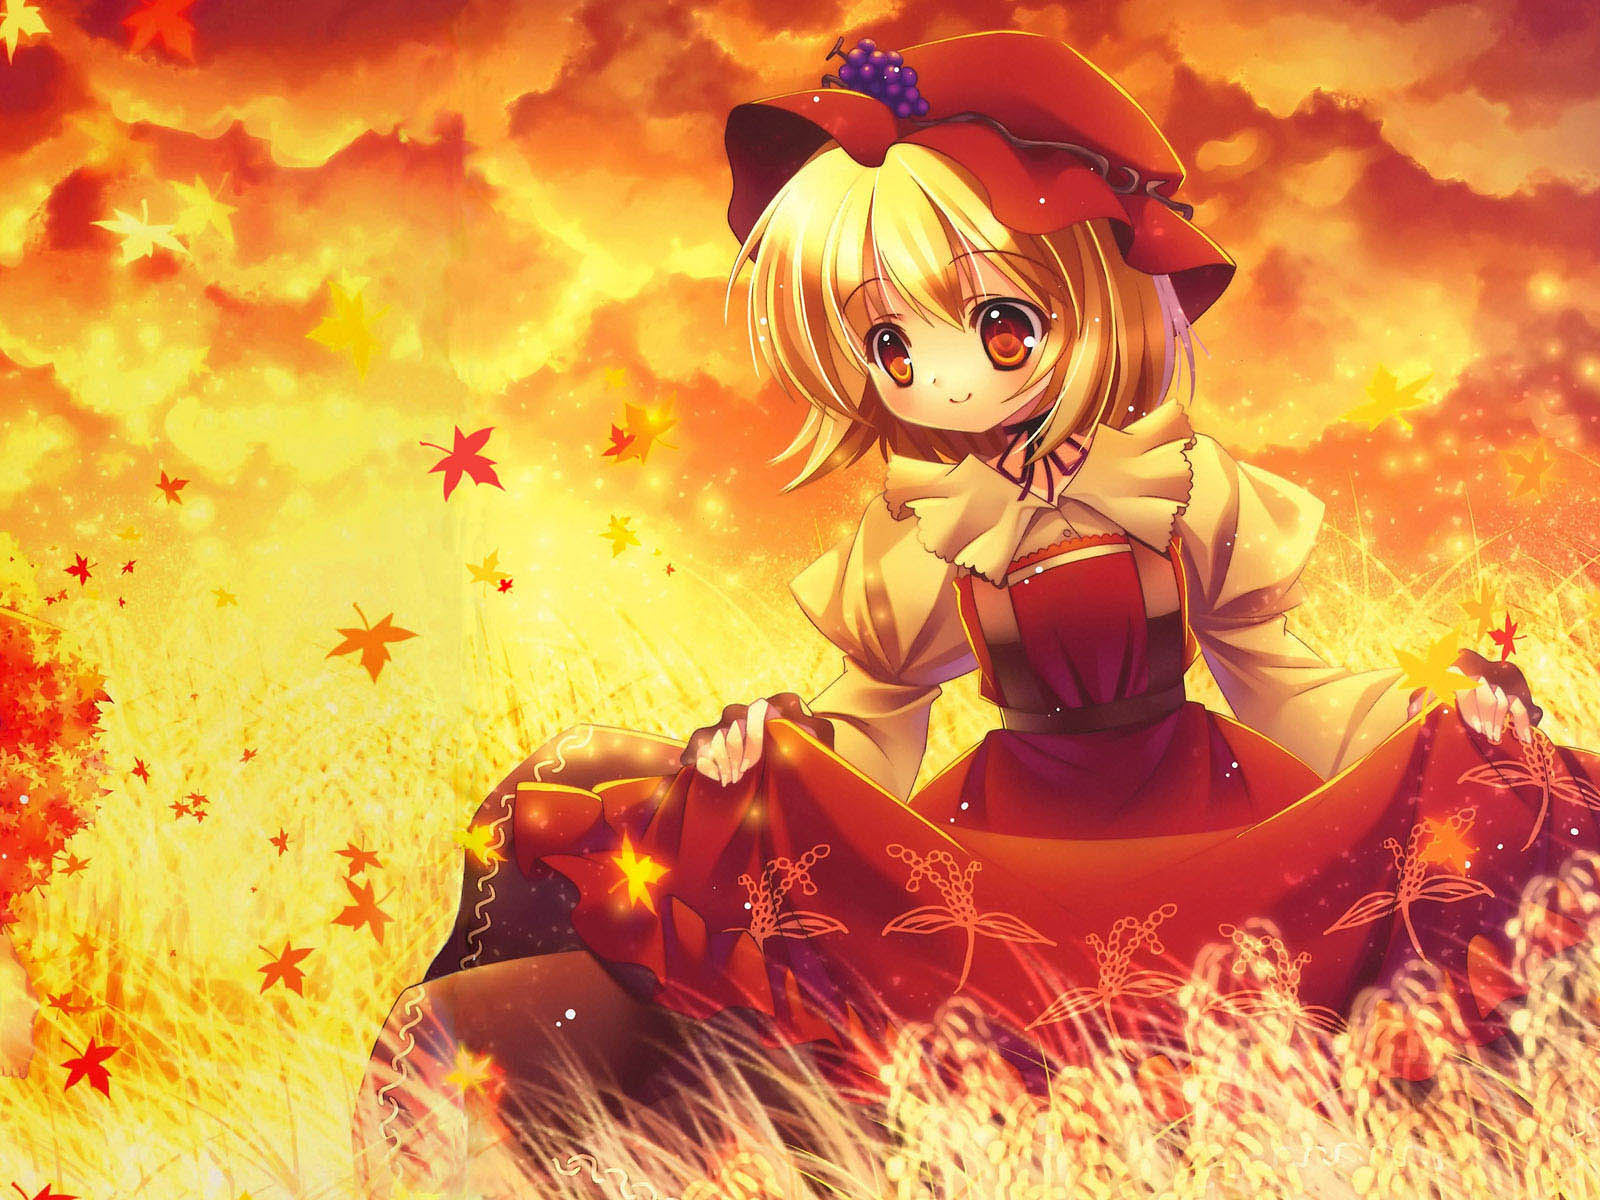 wallpapers: Anime Girl Wallpapers